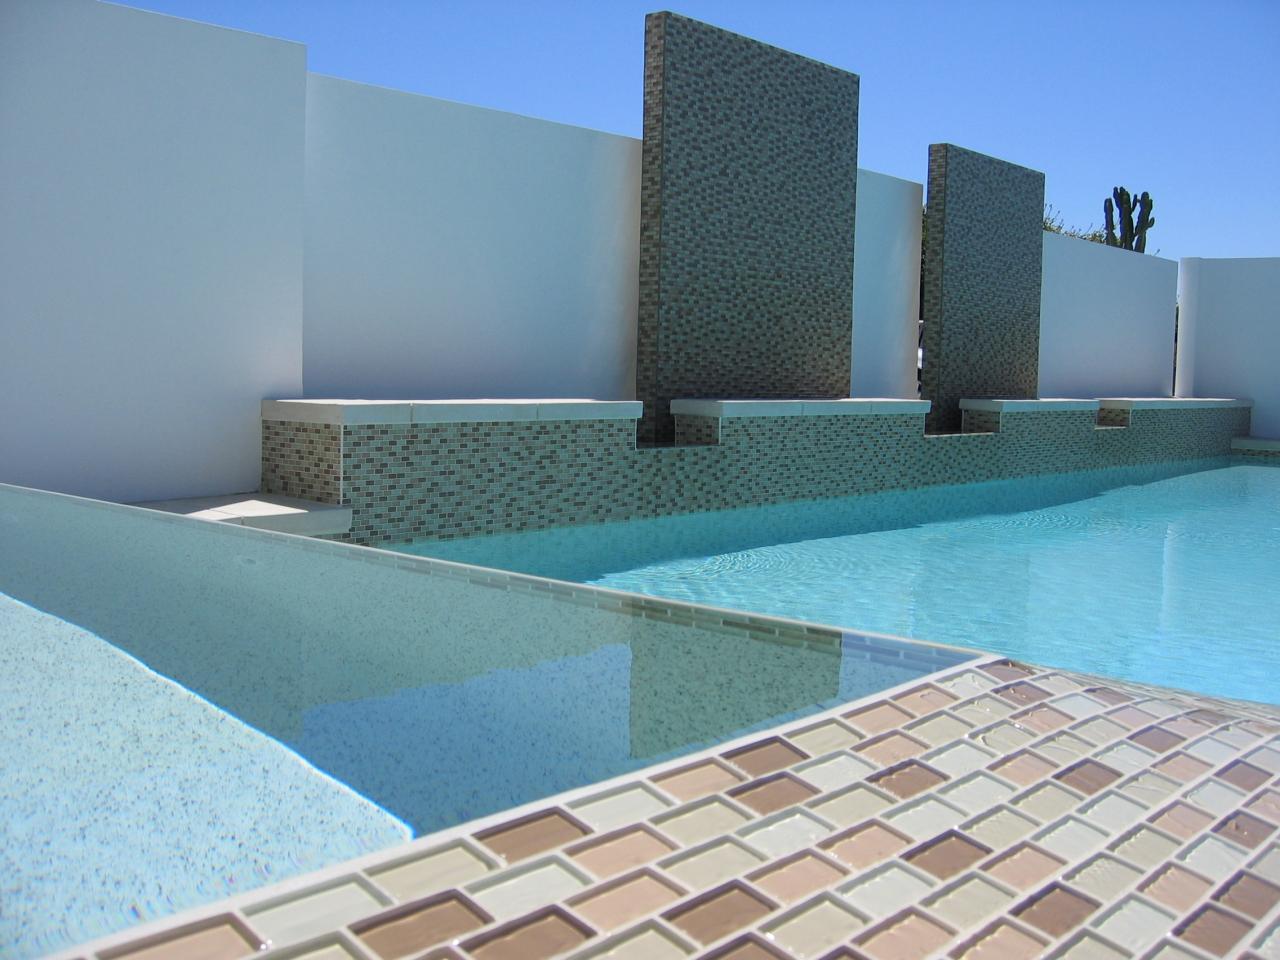 sage-design-studios_malibu-i-residence_2_jpg_rend_hgtvcom_1280_960.jpeg